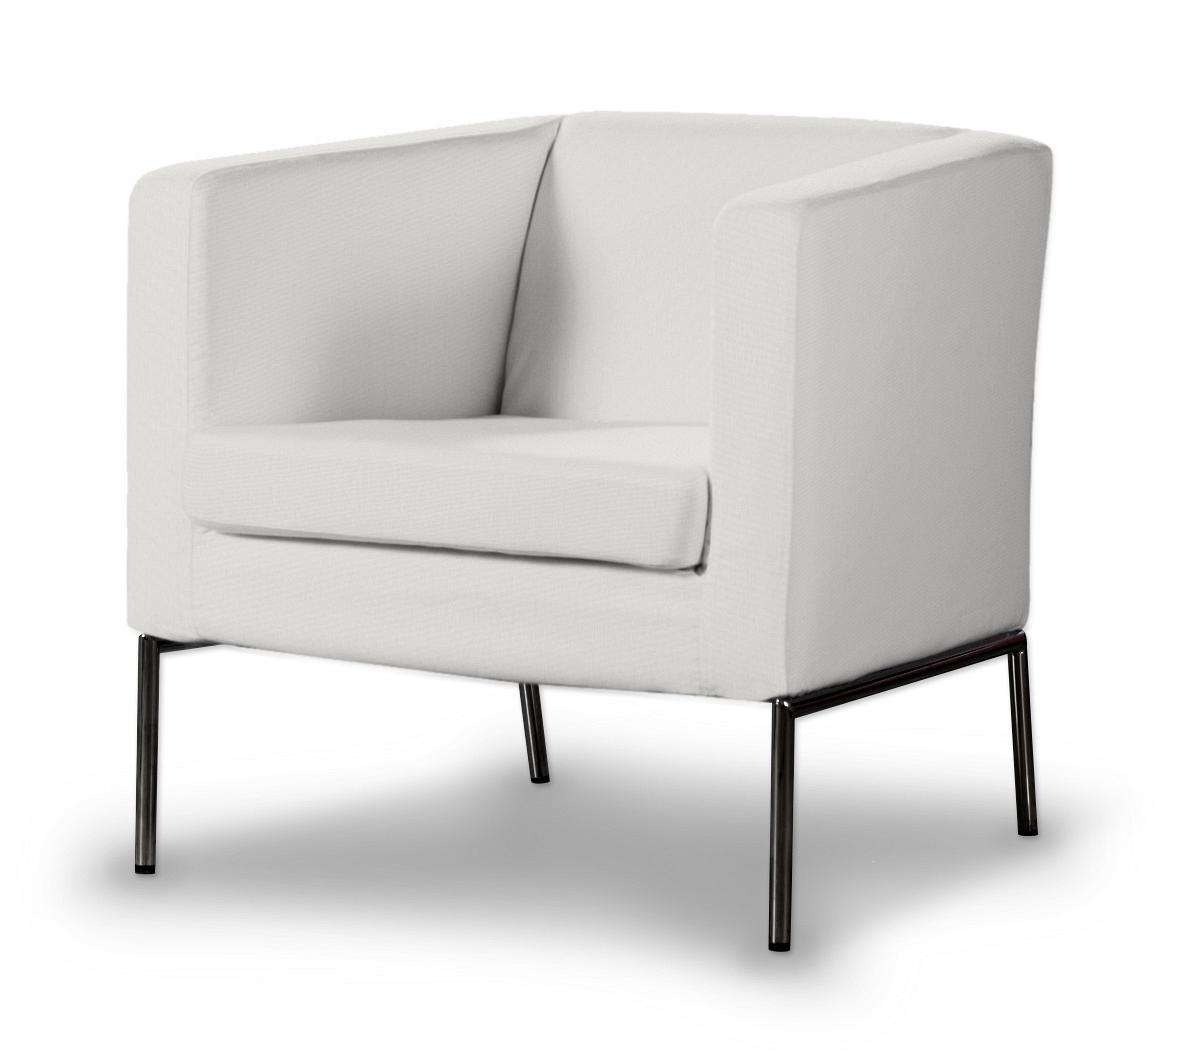 Klappsta Sesselbezug Sessel Klappsta von der Kollektion Etna, Stoff: 705-01